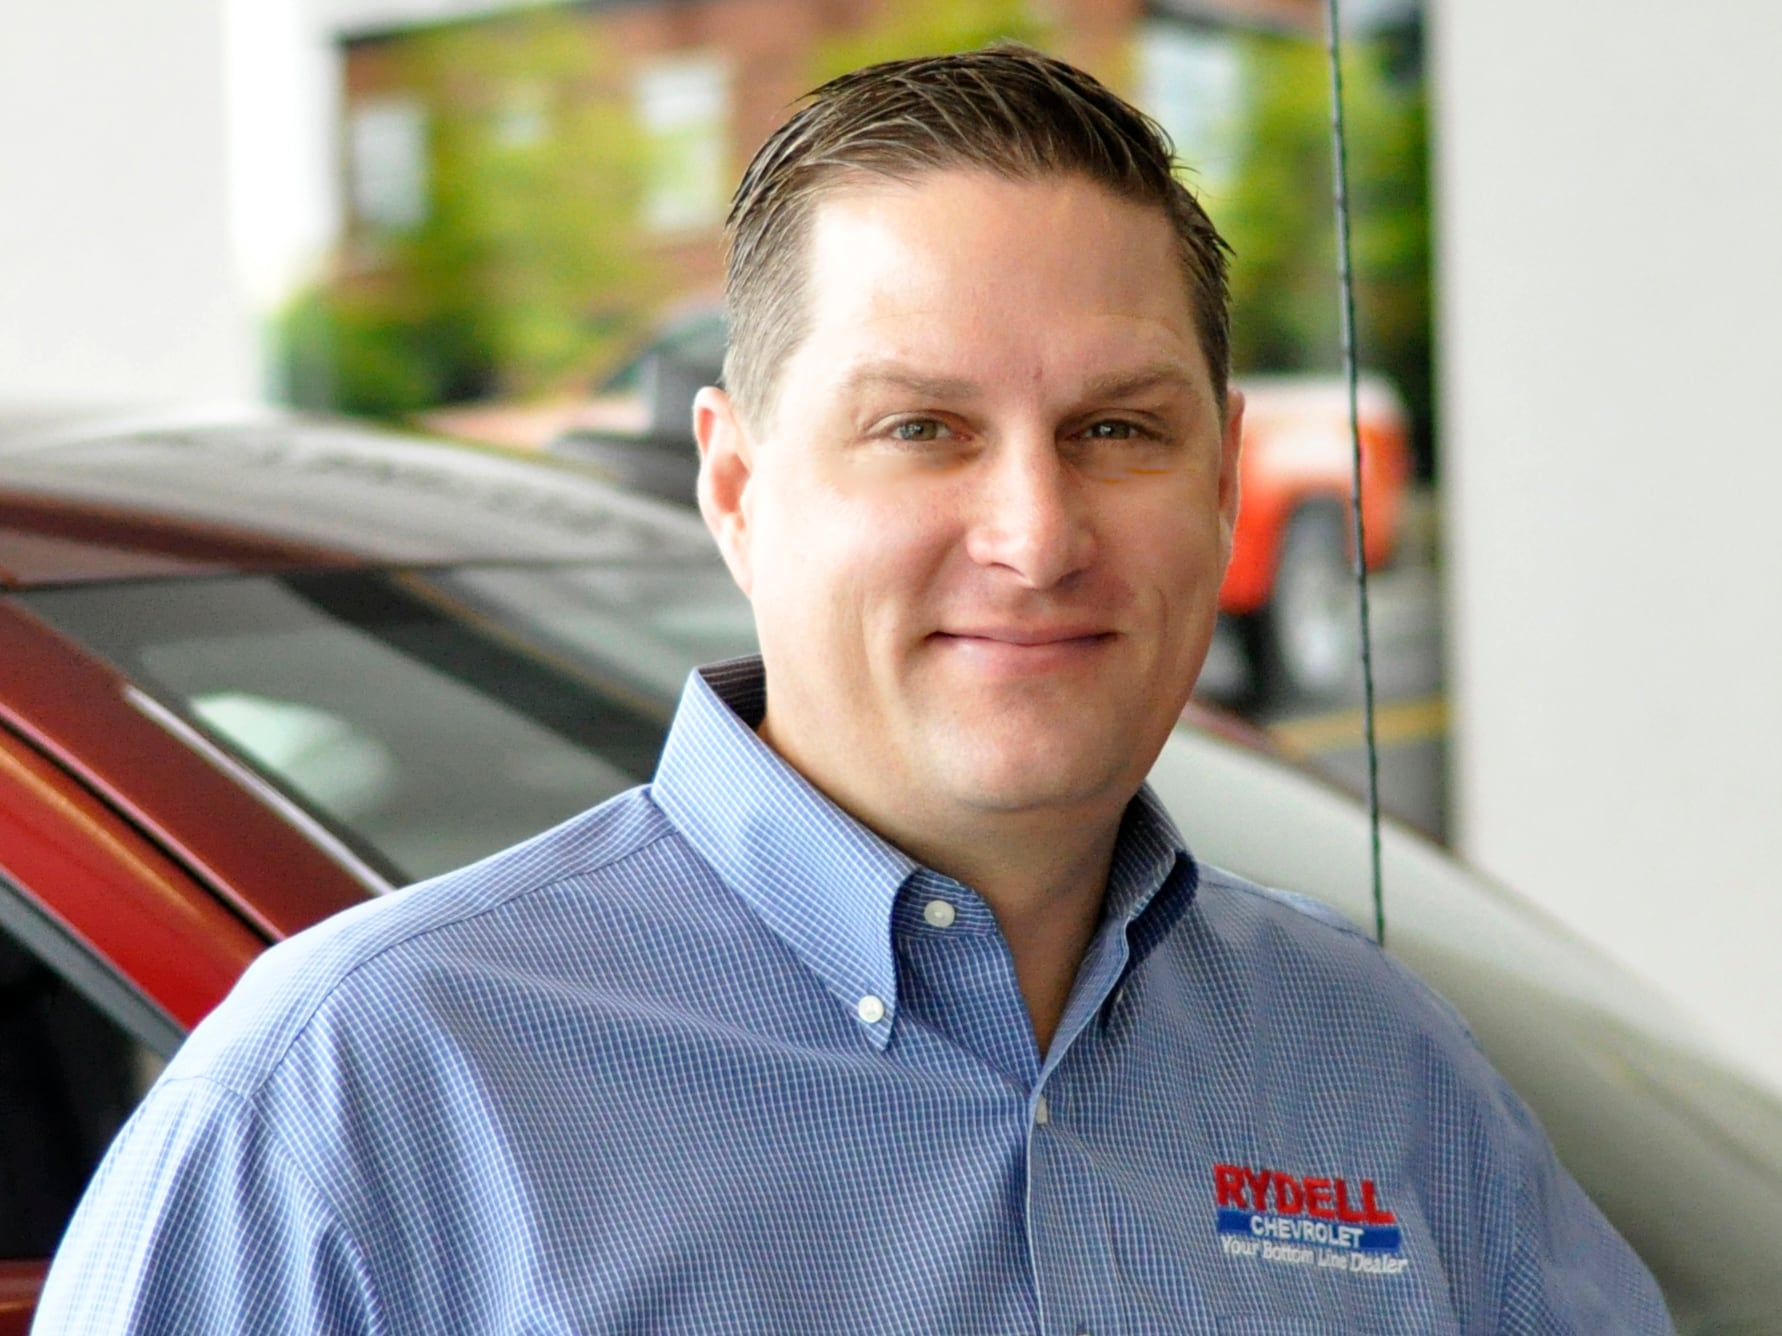 RydellAuto.com | New Dodge, Jeep, Lincoln, Chevrolet, Ford, Chrysler ...